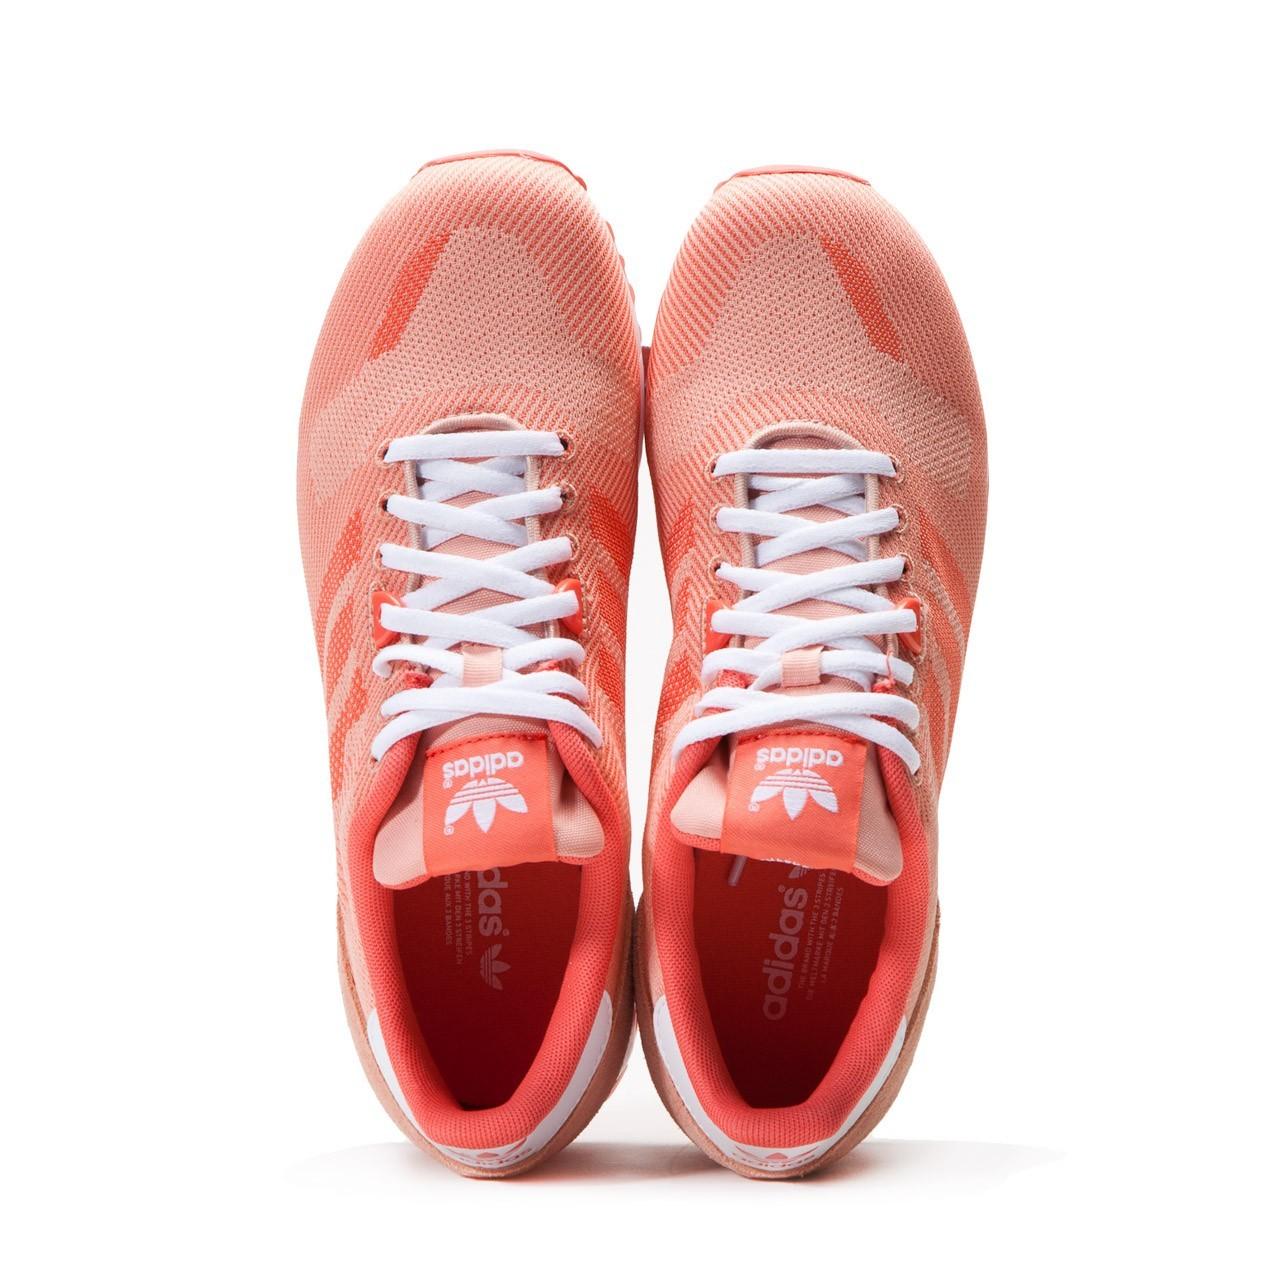 adidas online - cittasostenibili.it c1cb19e6f8955